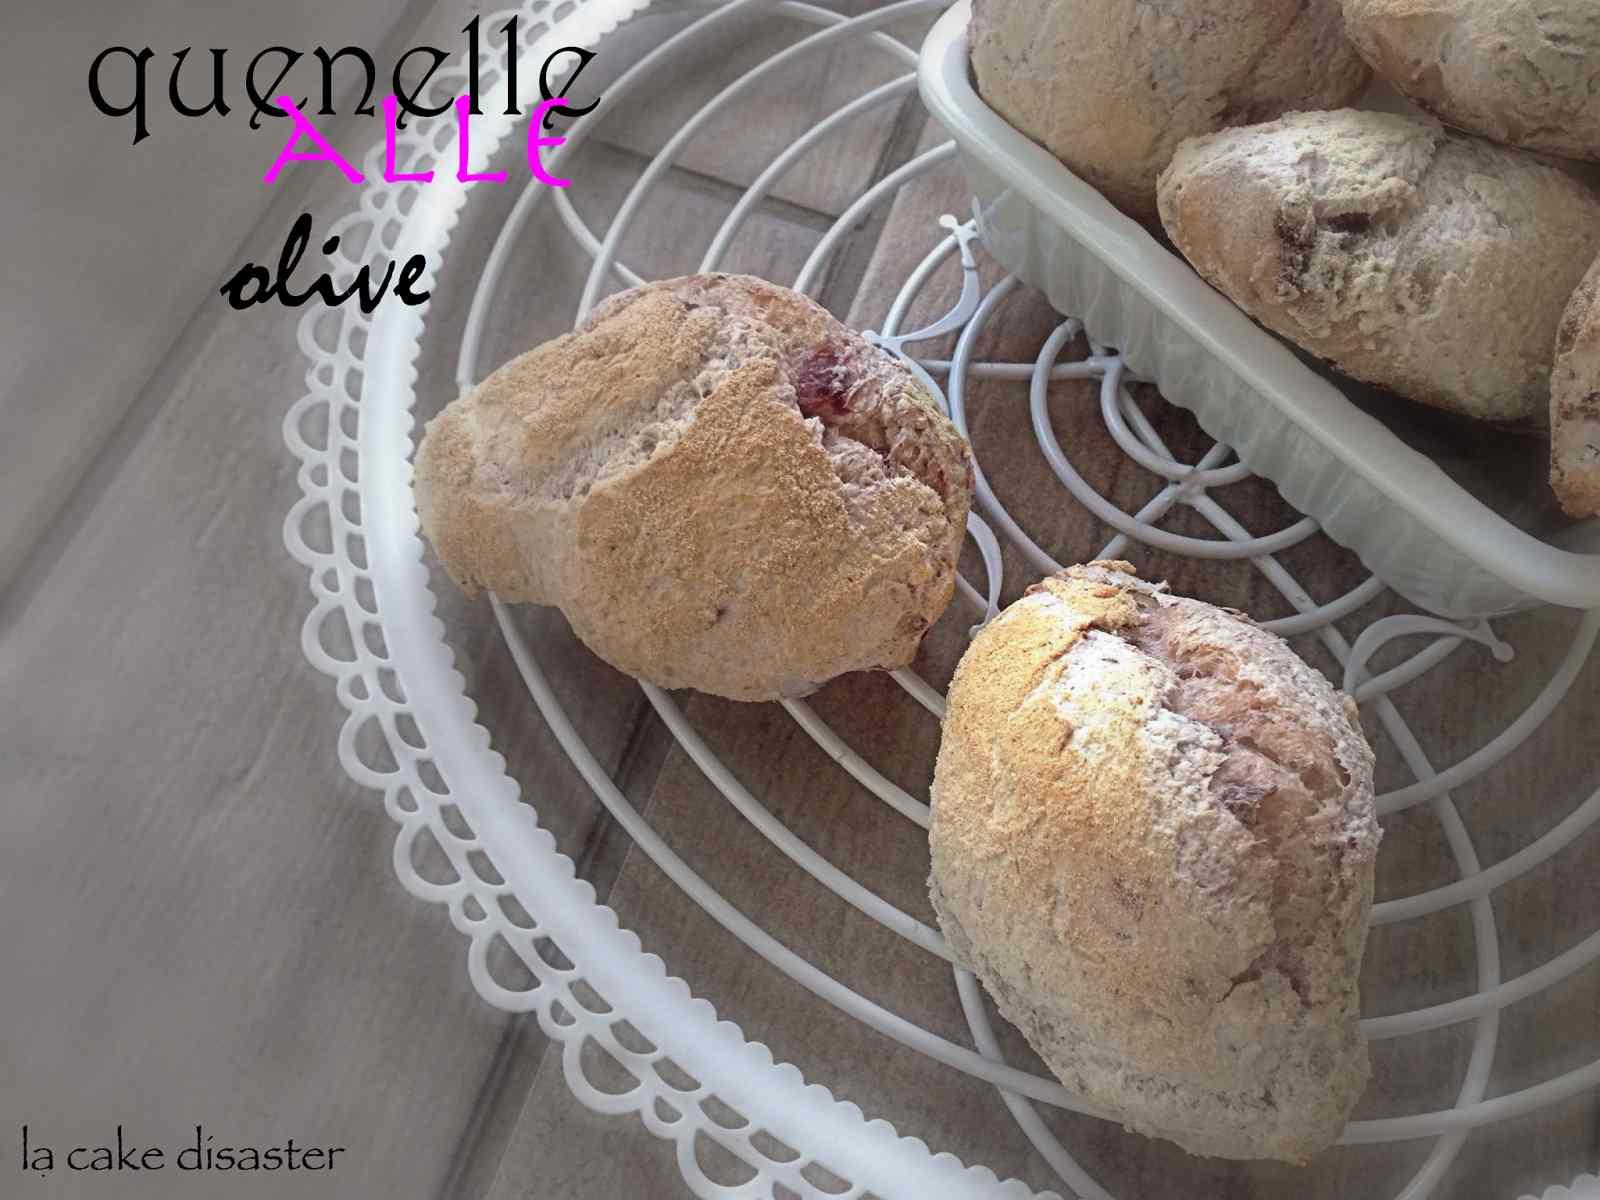 Ricetta: Quenelle alle olive gluten free